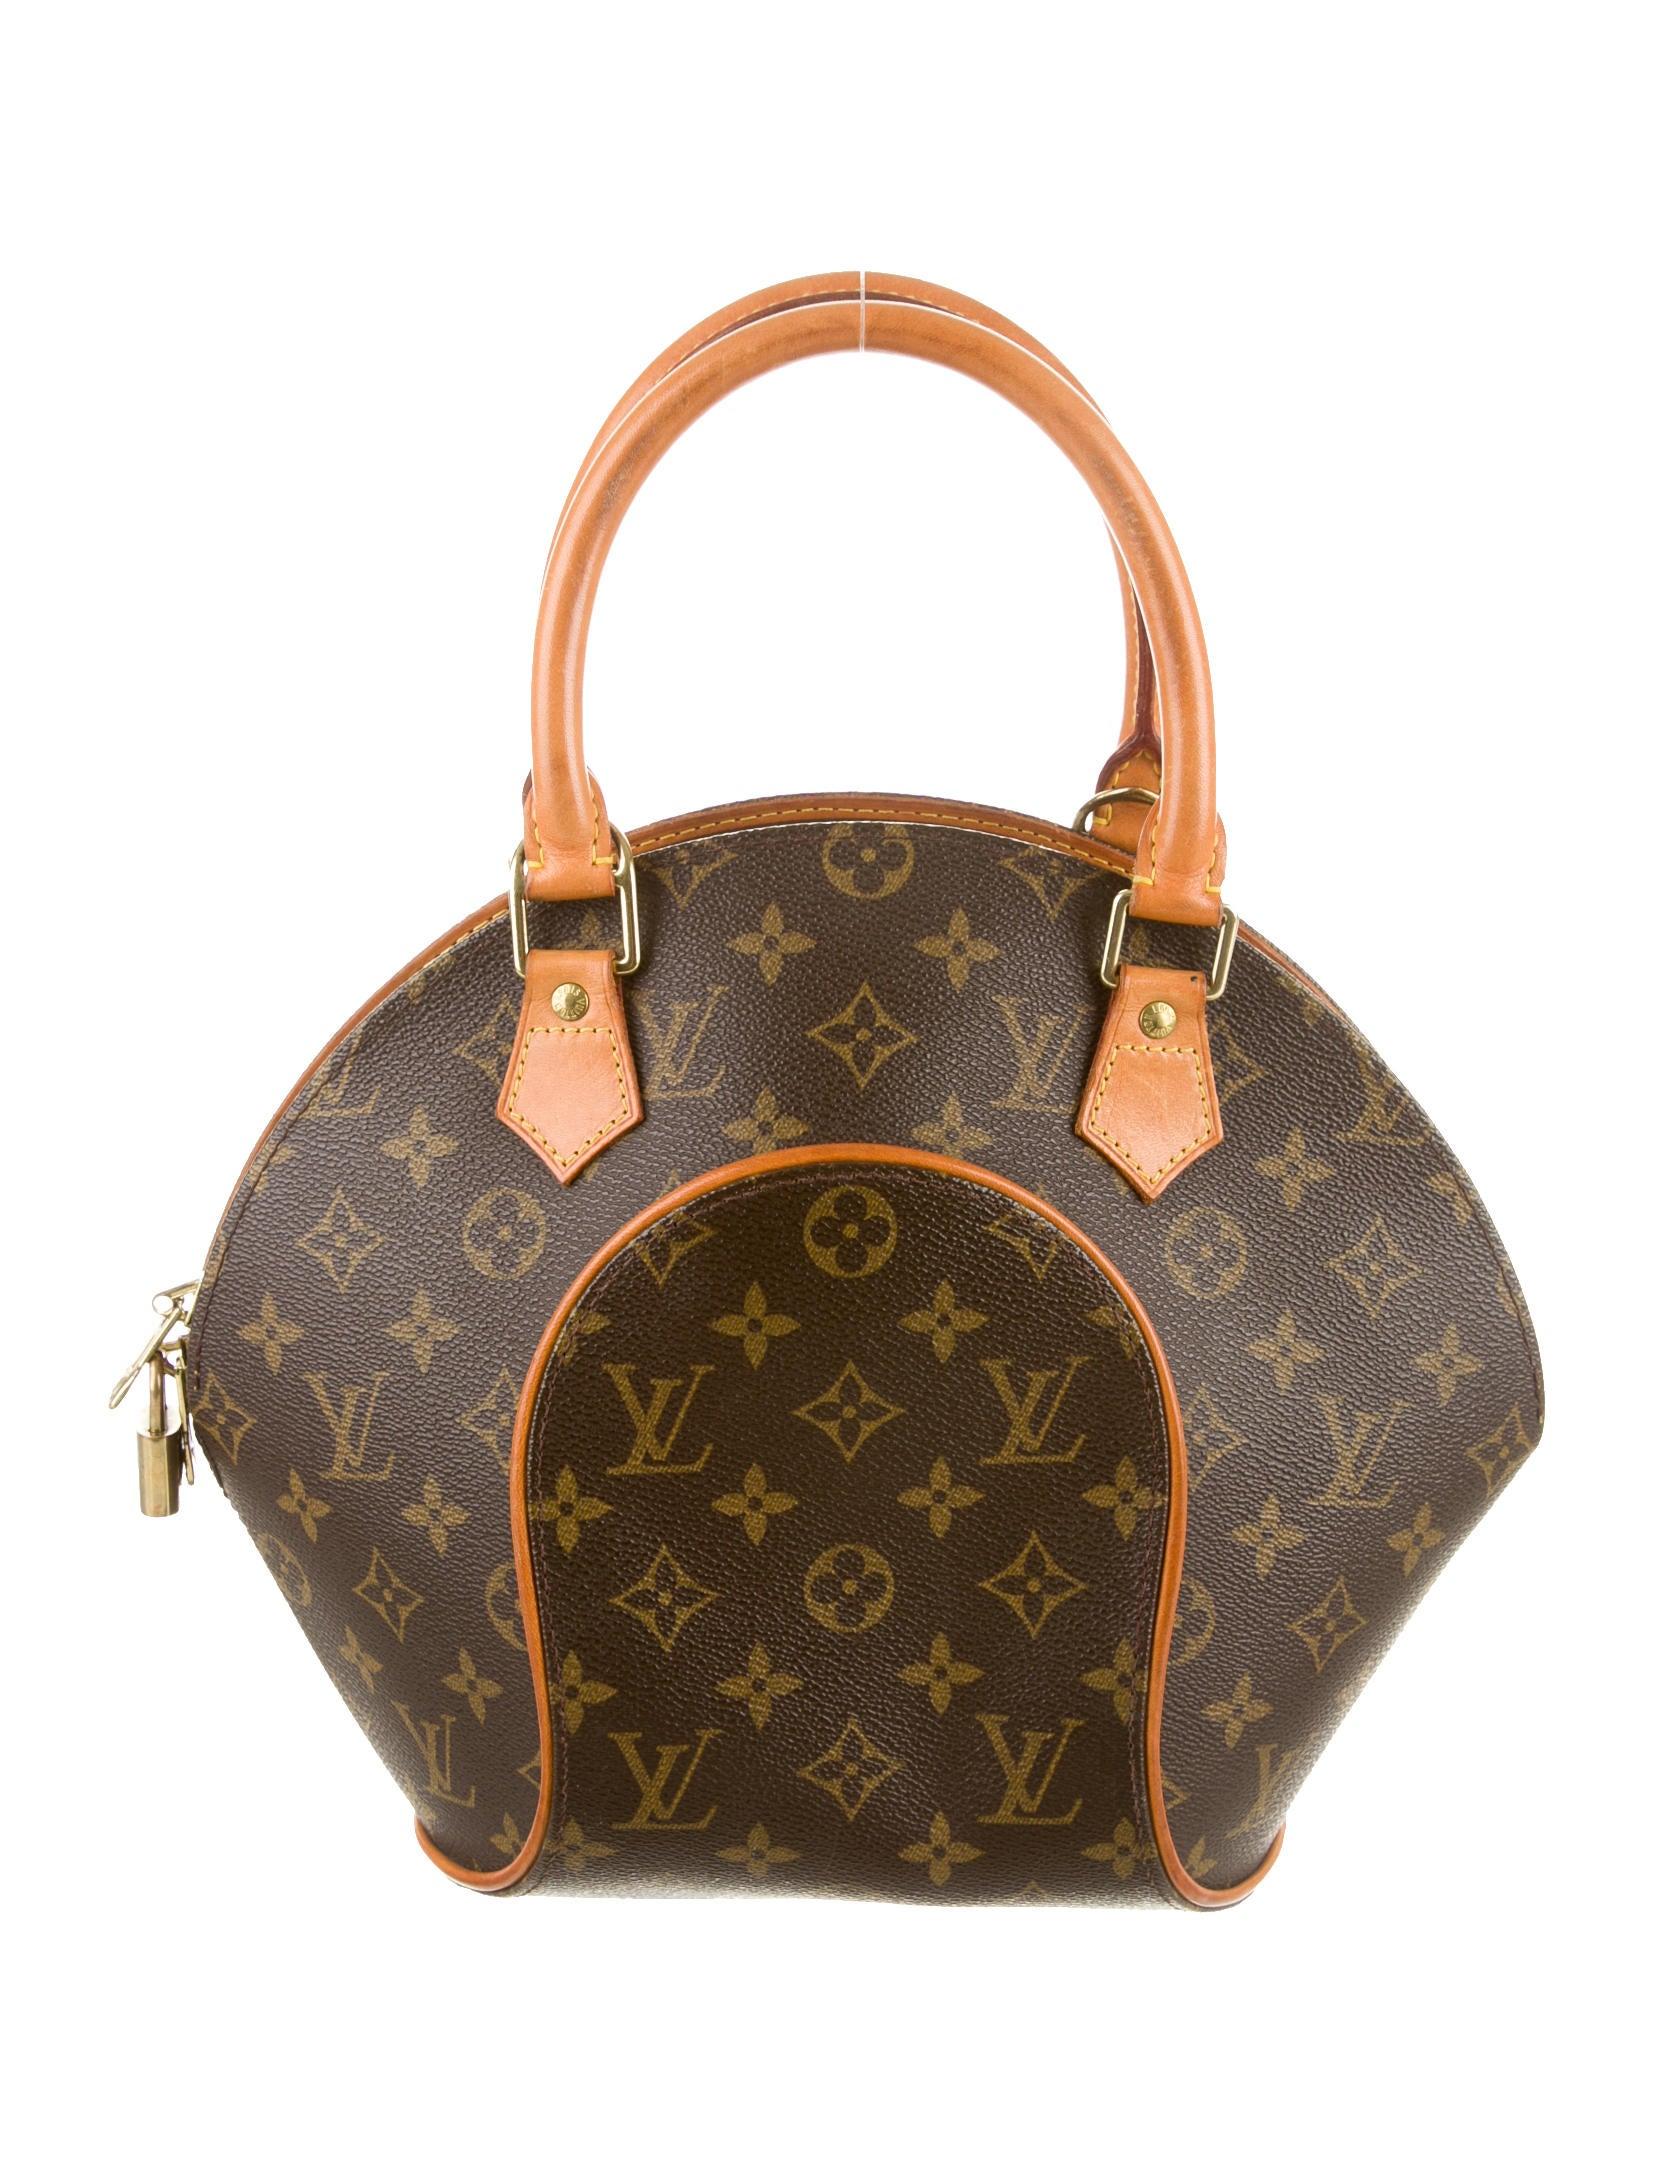 Beautiful Louis Vuitton Tweedy Rabat Bag - Handbags - LOU64530   The RealReal